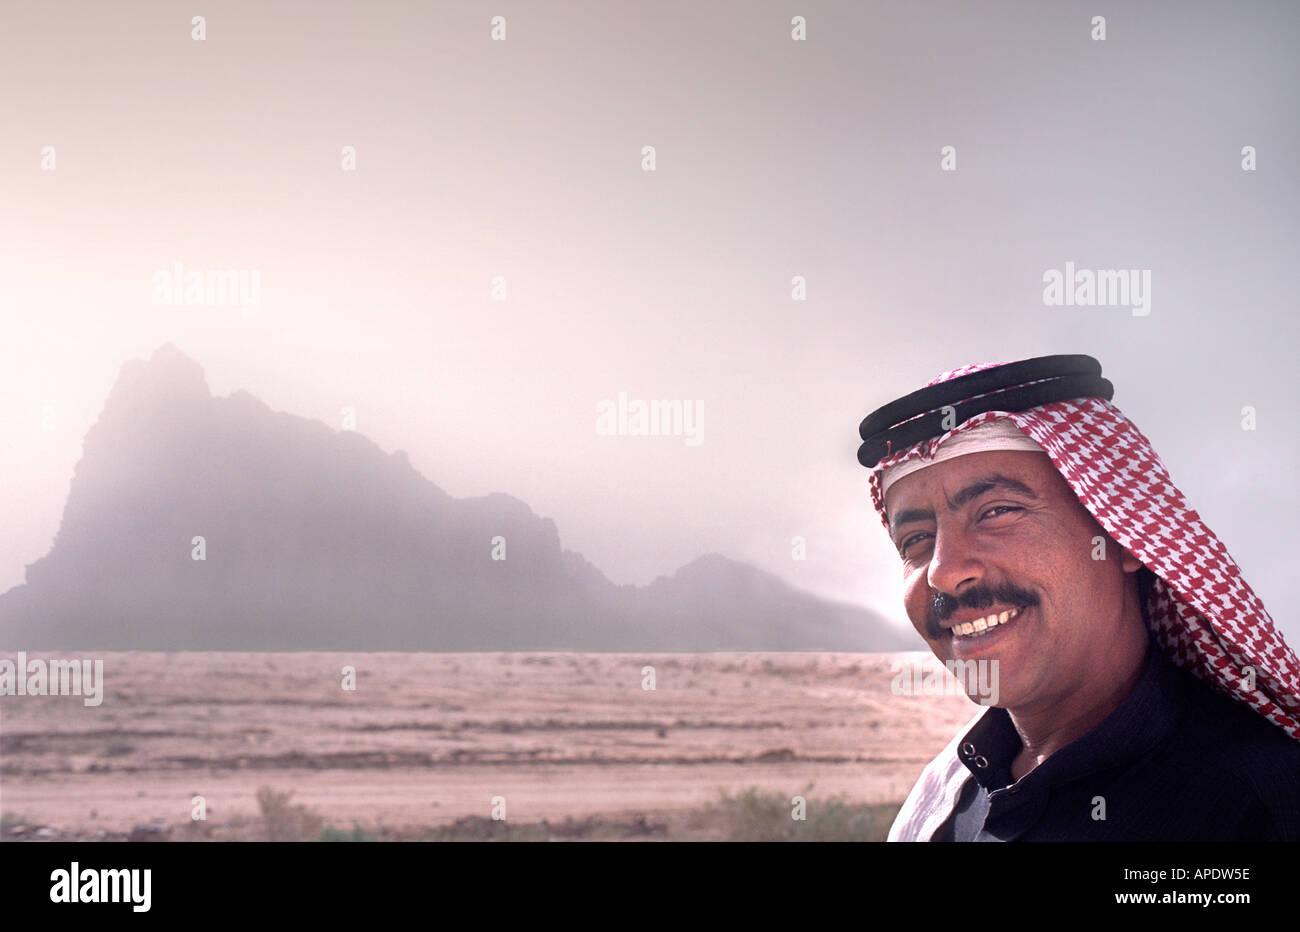 Jordanian Bedouin man wearing a keffiyah a traditional Arab headscarf Wadi Rum Jordan - Stock Image